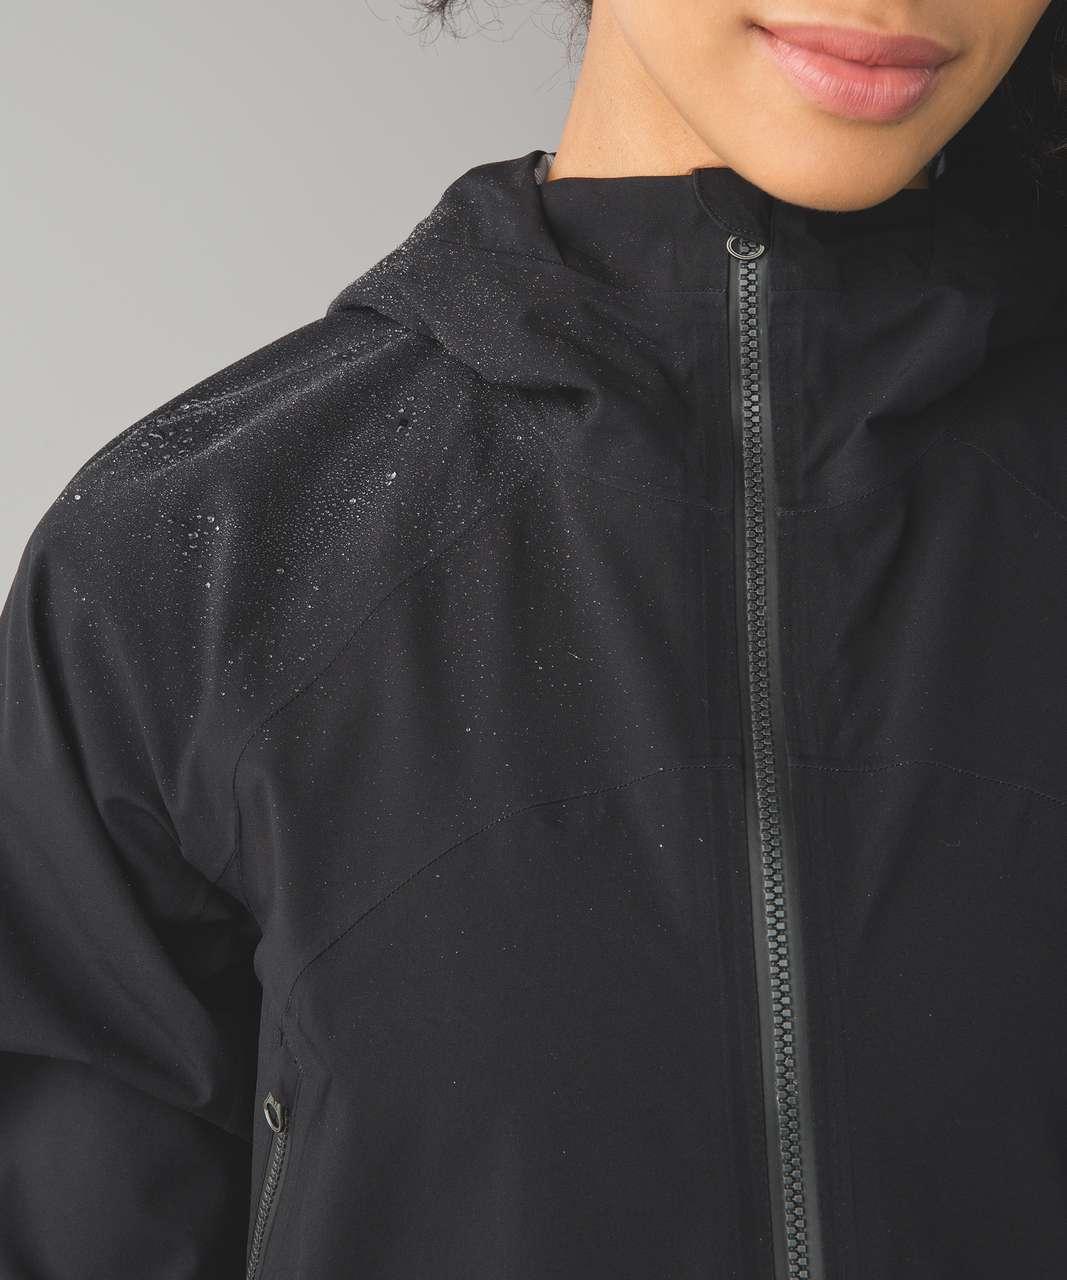 Lululemon Aint No Rain Jacket Black Lulu Fanatics